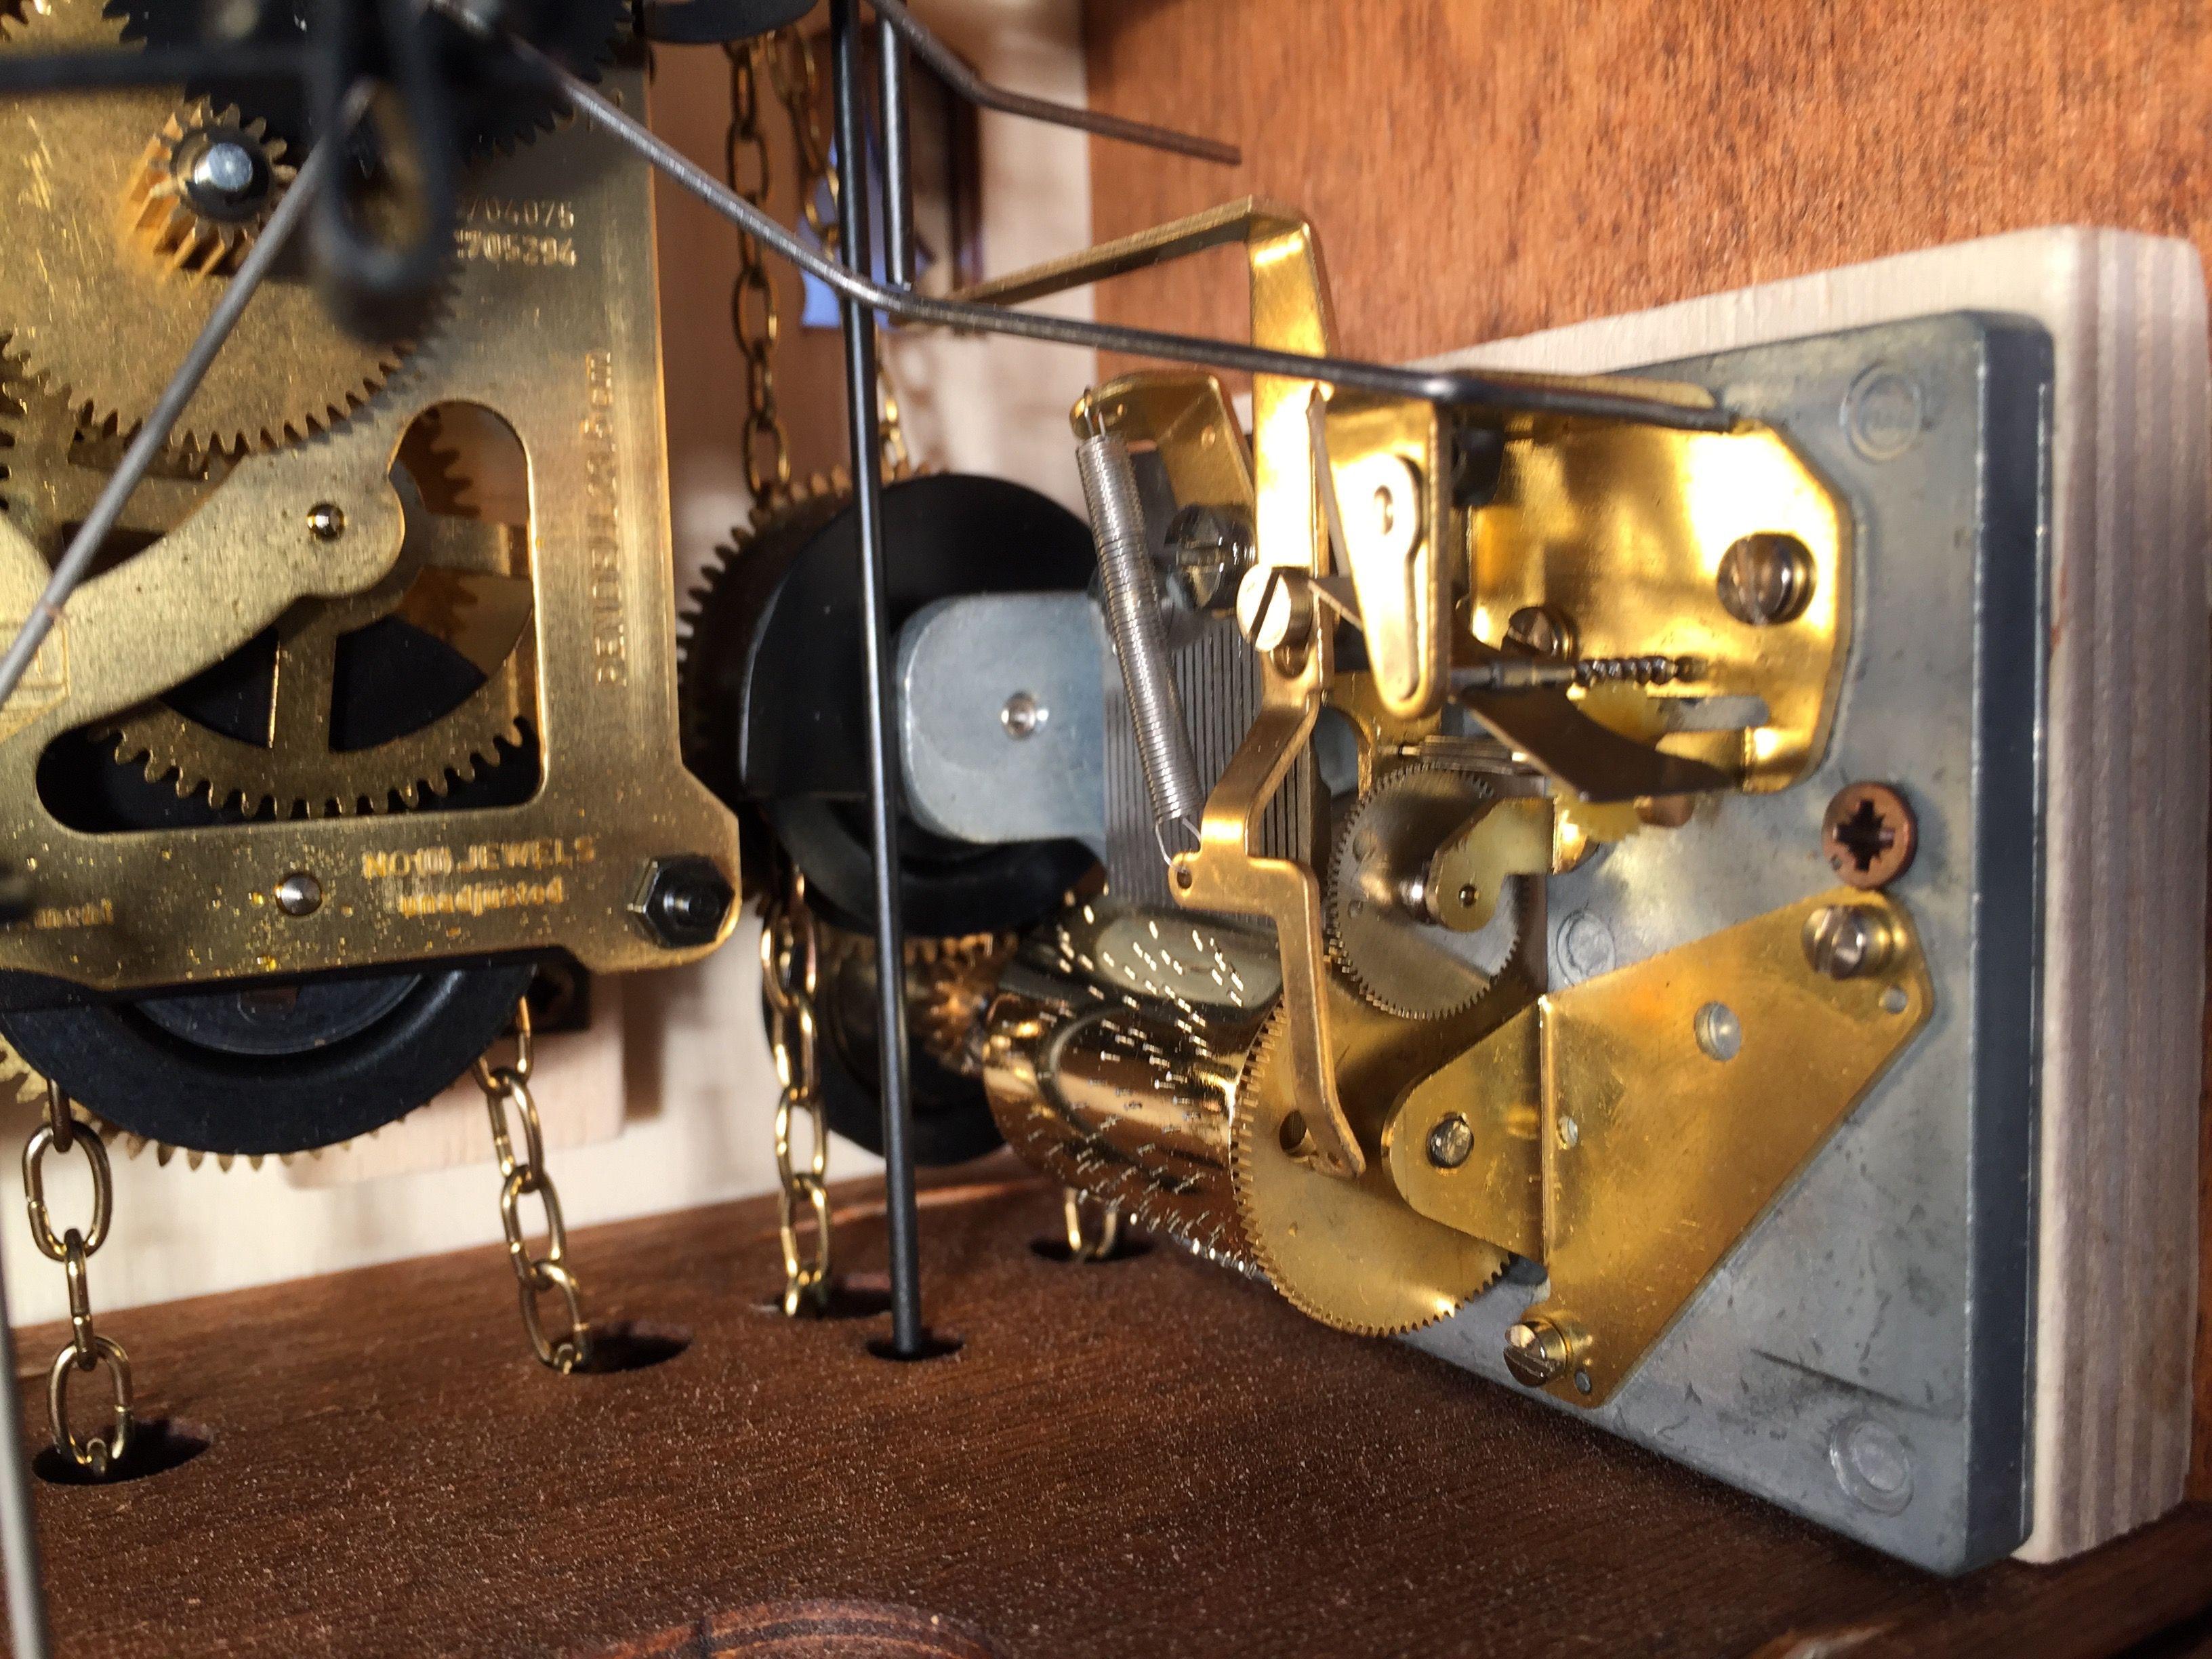 DIY Cuckoo Clock Repair Guide | Clock repair, Diy clock, Clock